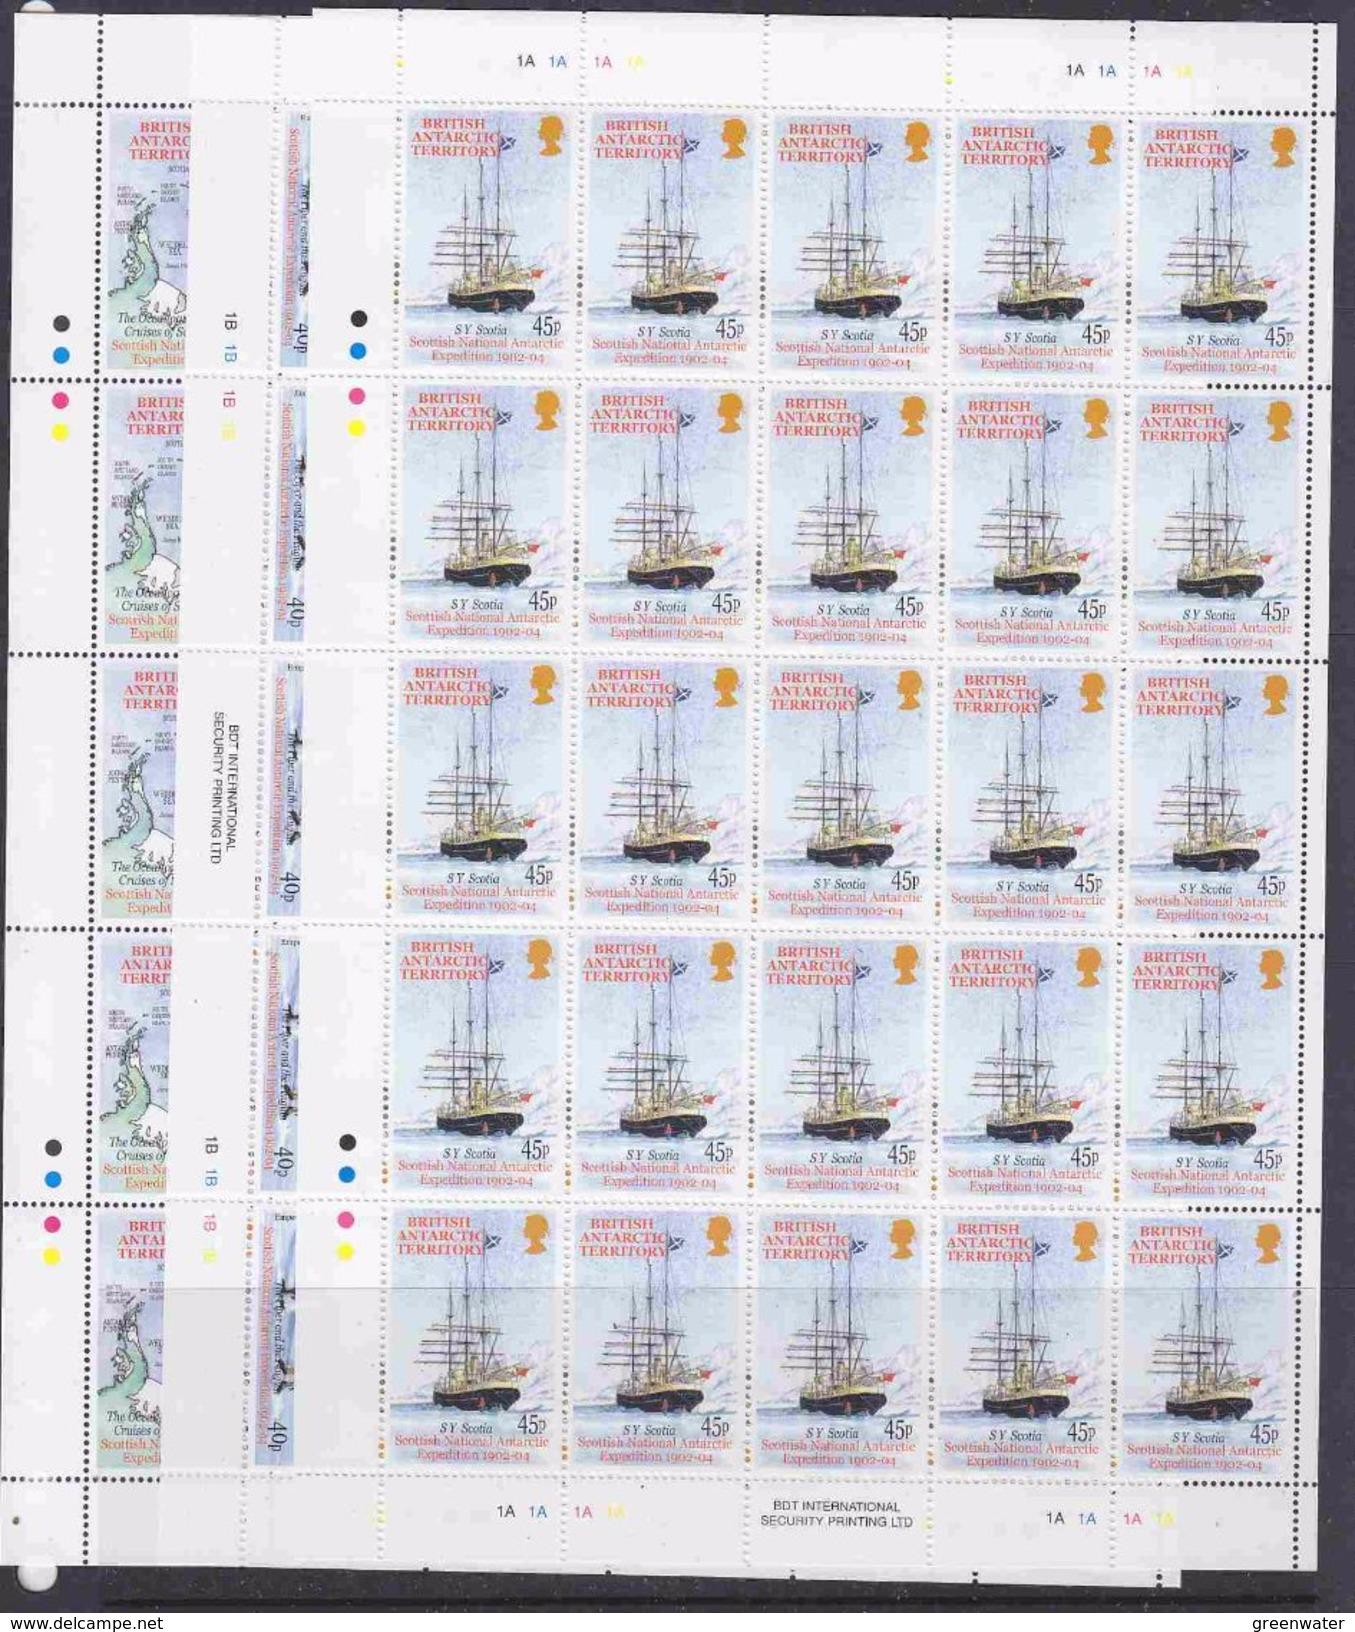 British Antarctic Territory 2001 Scottish National Antarctic Expedition 6v Sheetlets (unfolded)  ** Mnh (F6720) - Brits Antarctisch Territorium  (BAT)